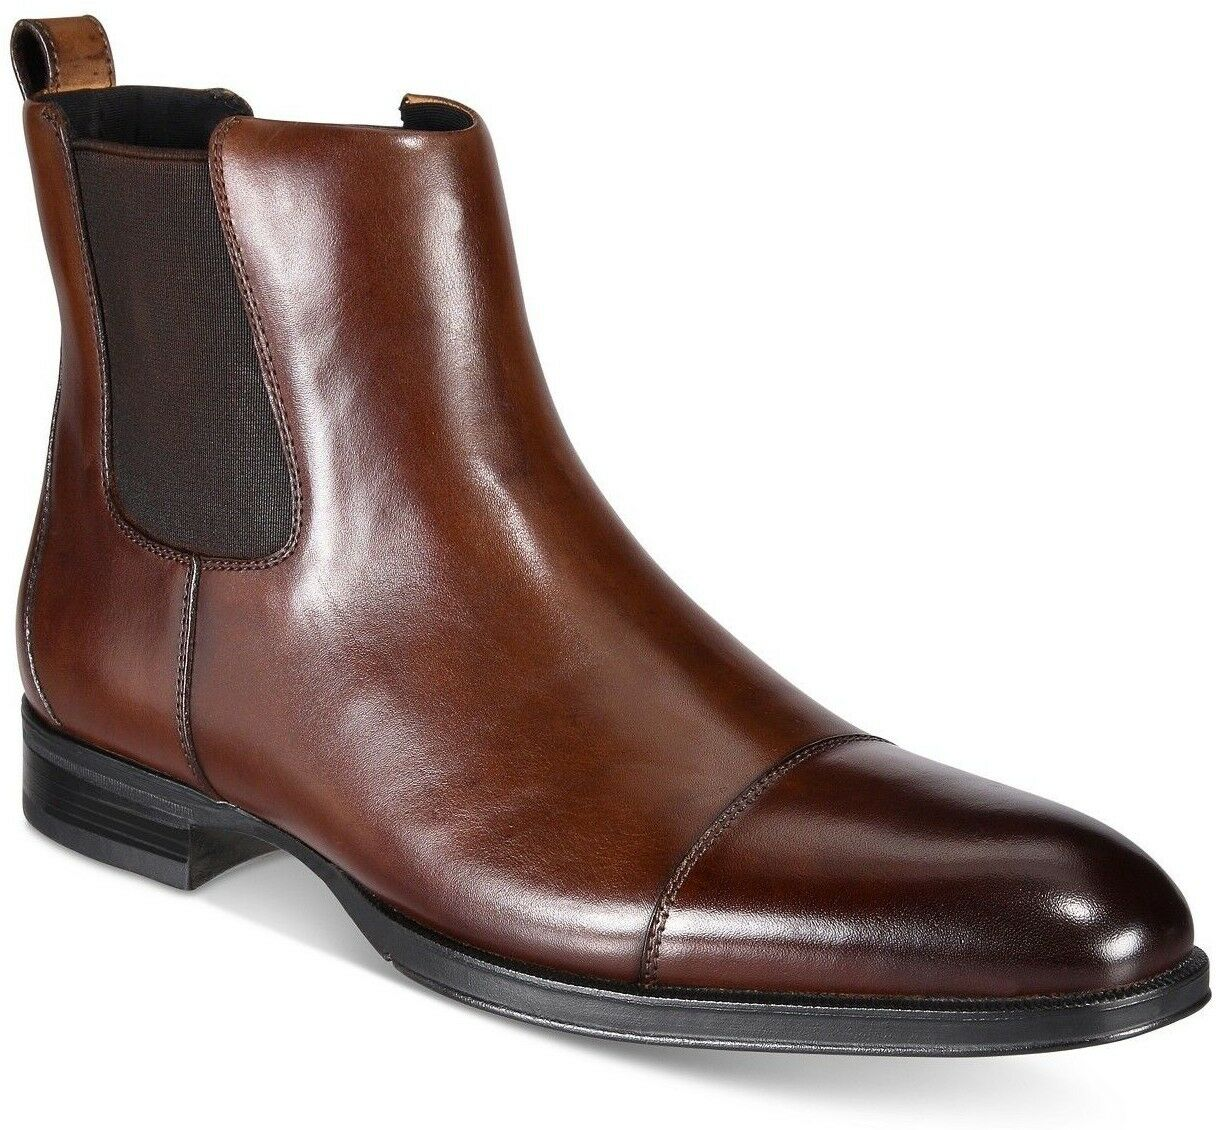 Alfani Men's Martin LEATHER Boots Cap Toe Slip On Dress Boots Size 10.5 M